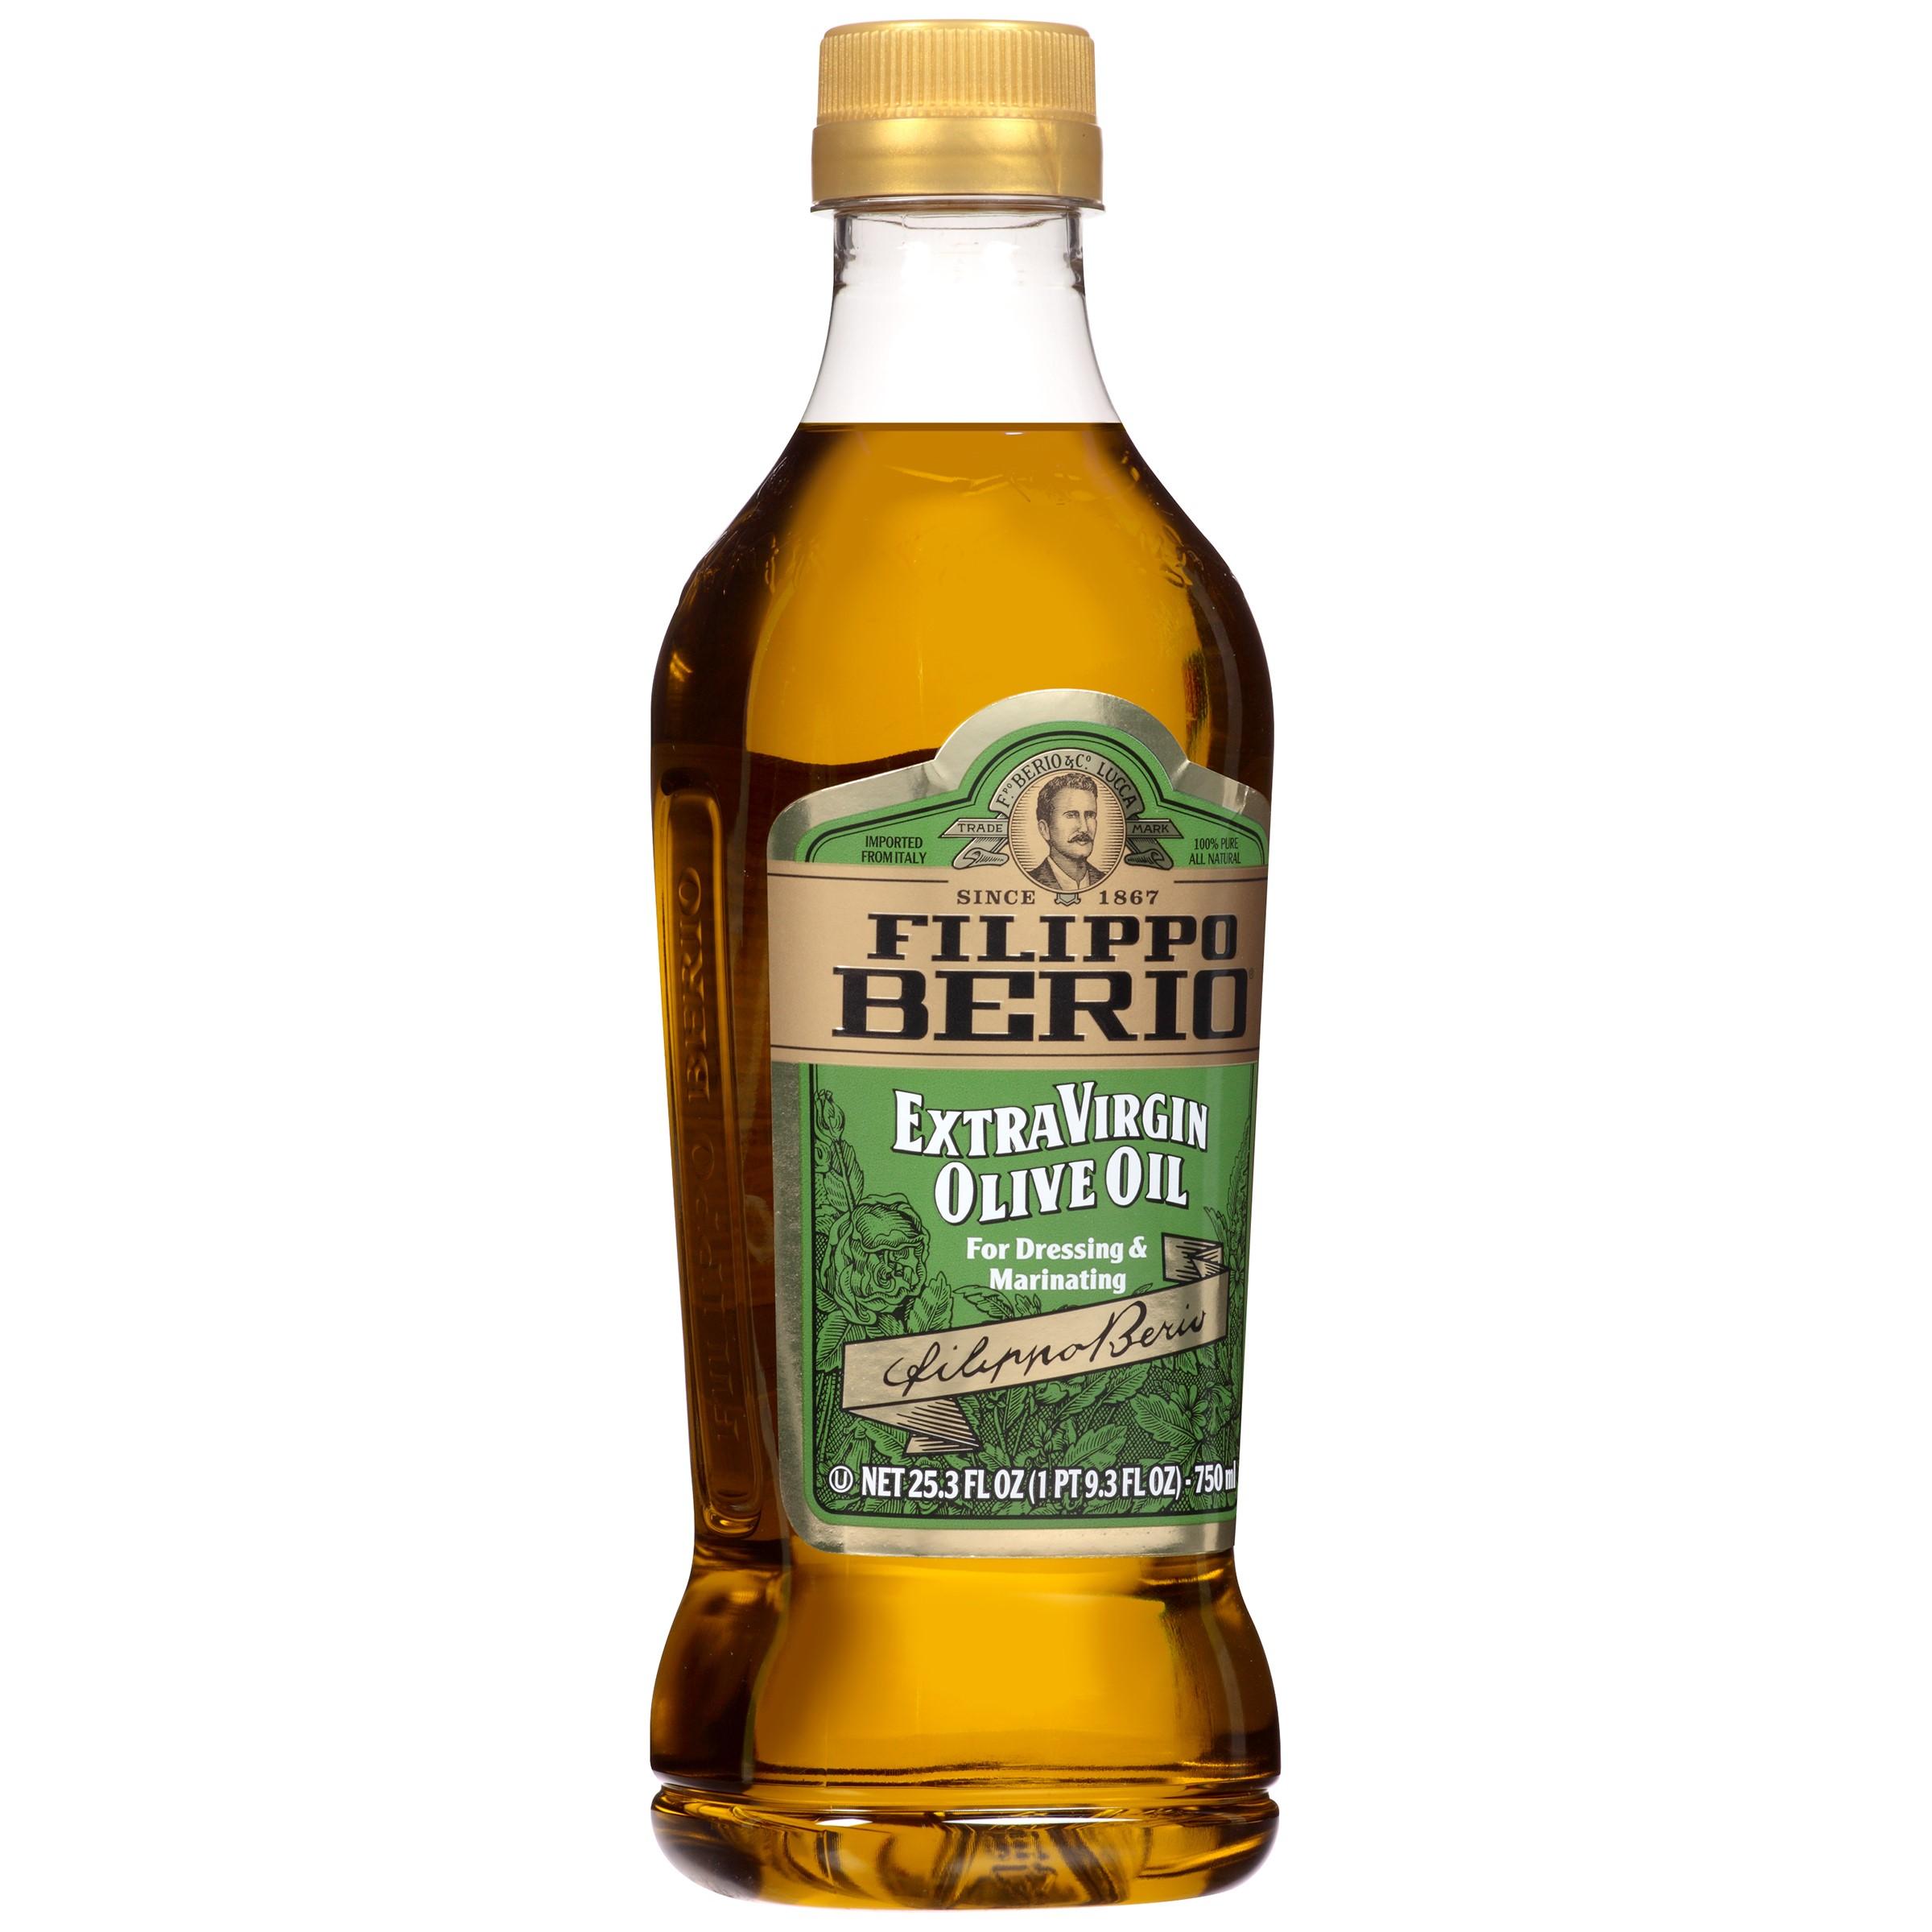 Filippo Berio Extra Virgin Olive Oil, 25.3 Ounce